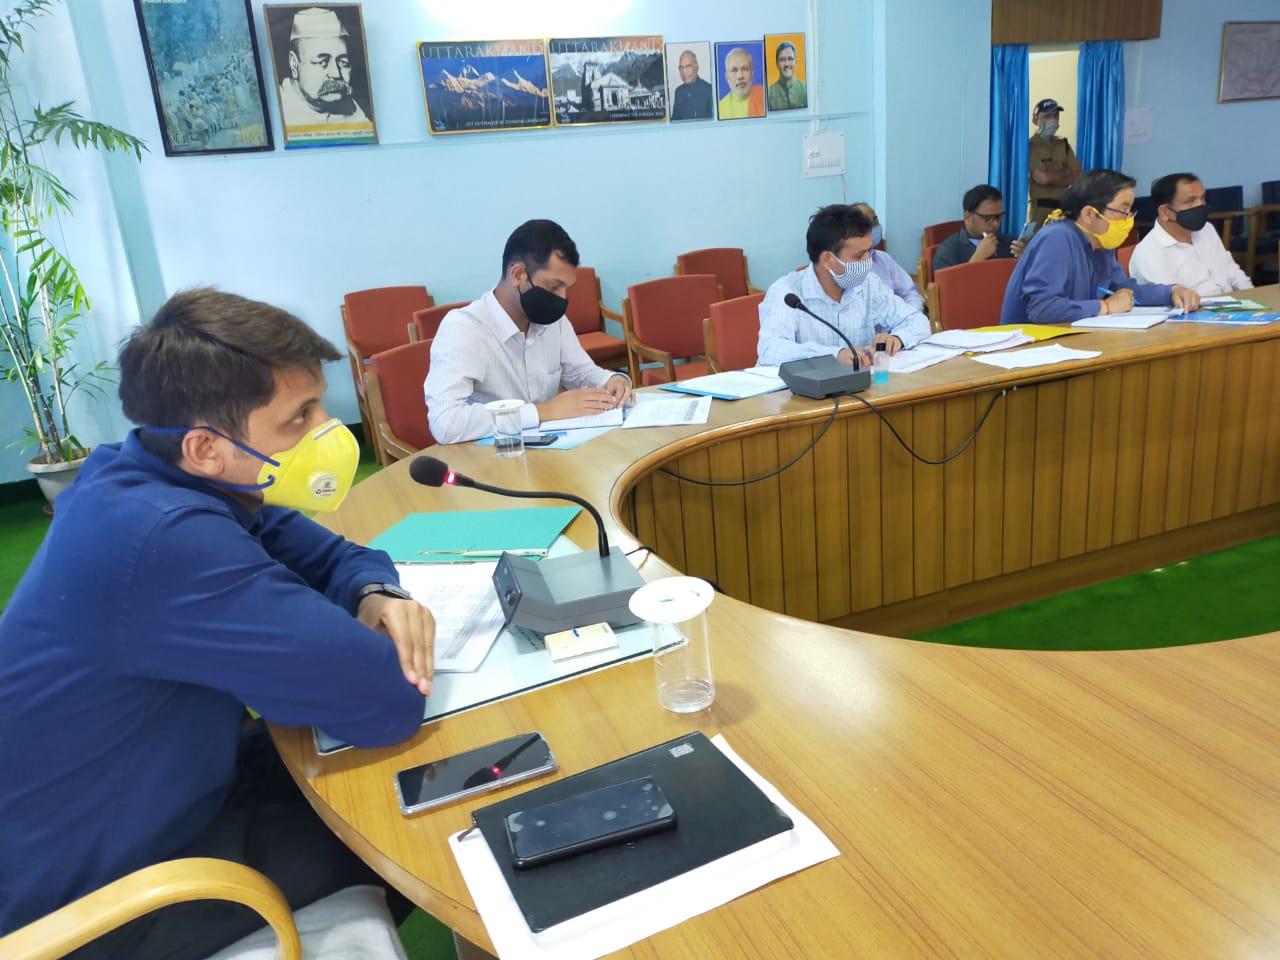 मुख्यमंत्री स्वरोजगार योजना के 74 आवेदन स्वीकृत